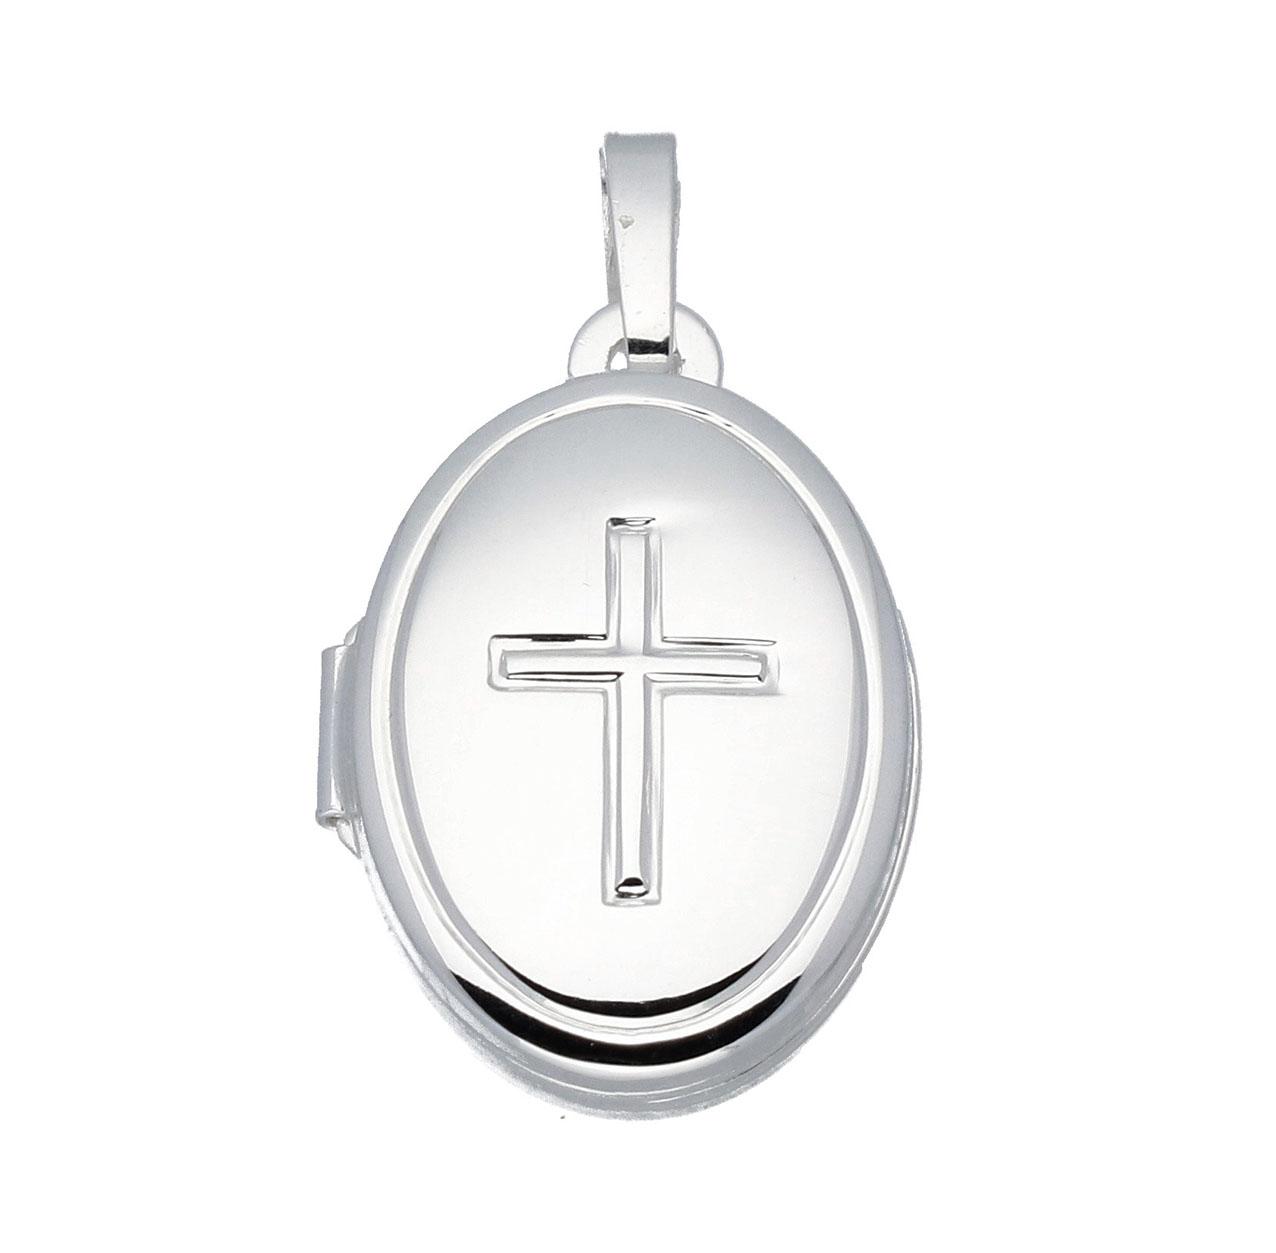 Zilveren Medaillon Ovaal - Kruis - 12 x 17 mm 145.0059.00